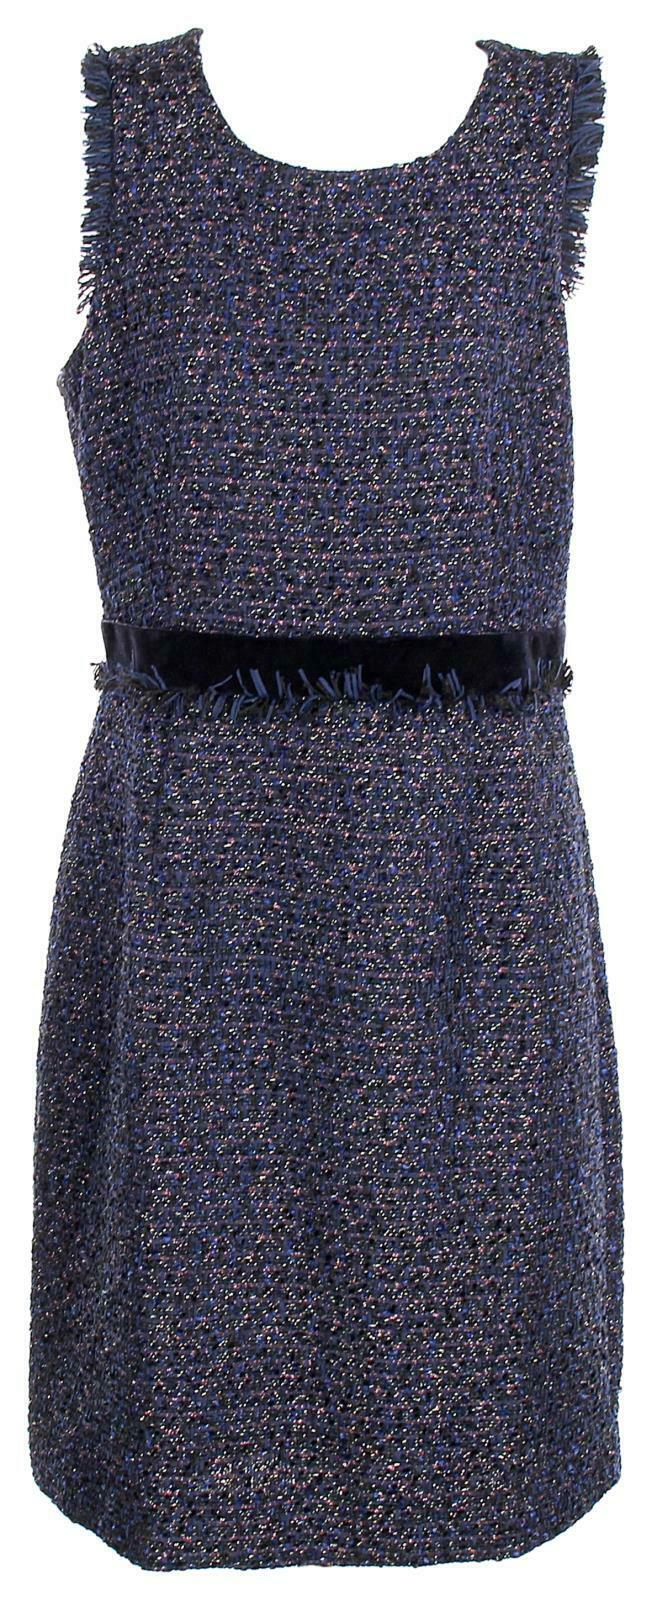 J Crew Woherren Sparkle Tweed Sleeveless Sheath Fringe Woven Dress Blau 10 H3599